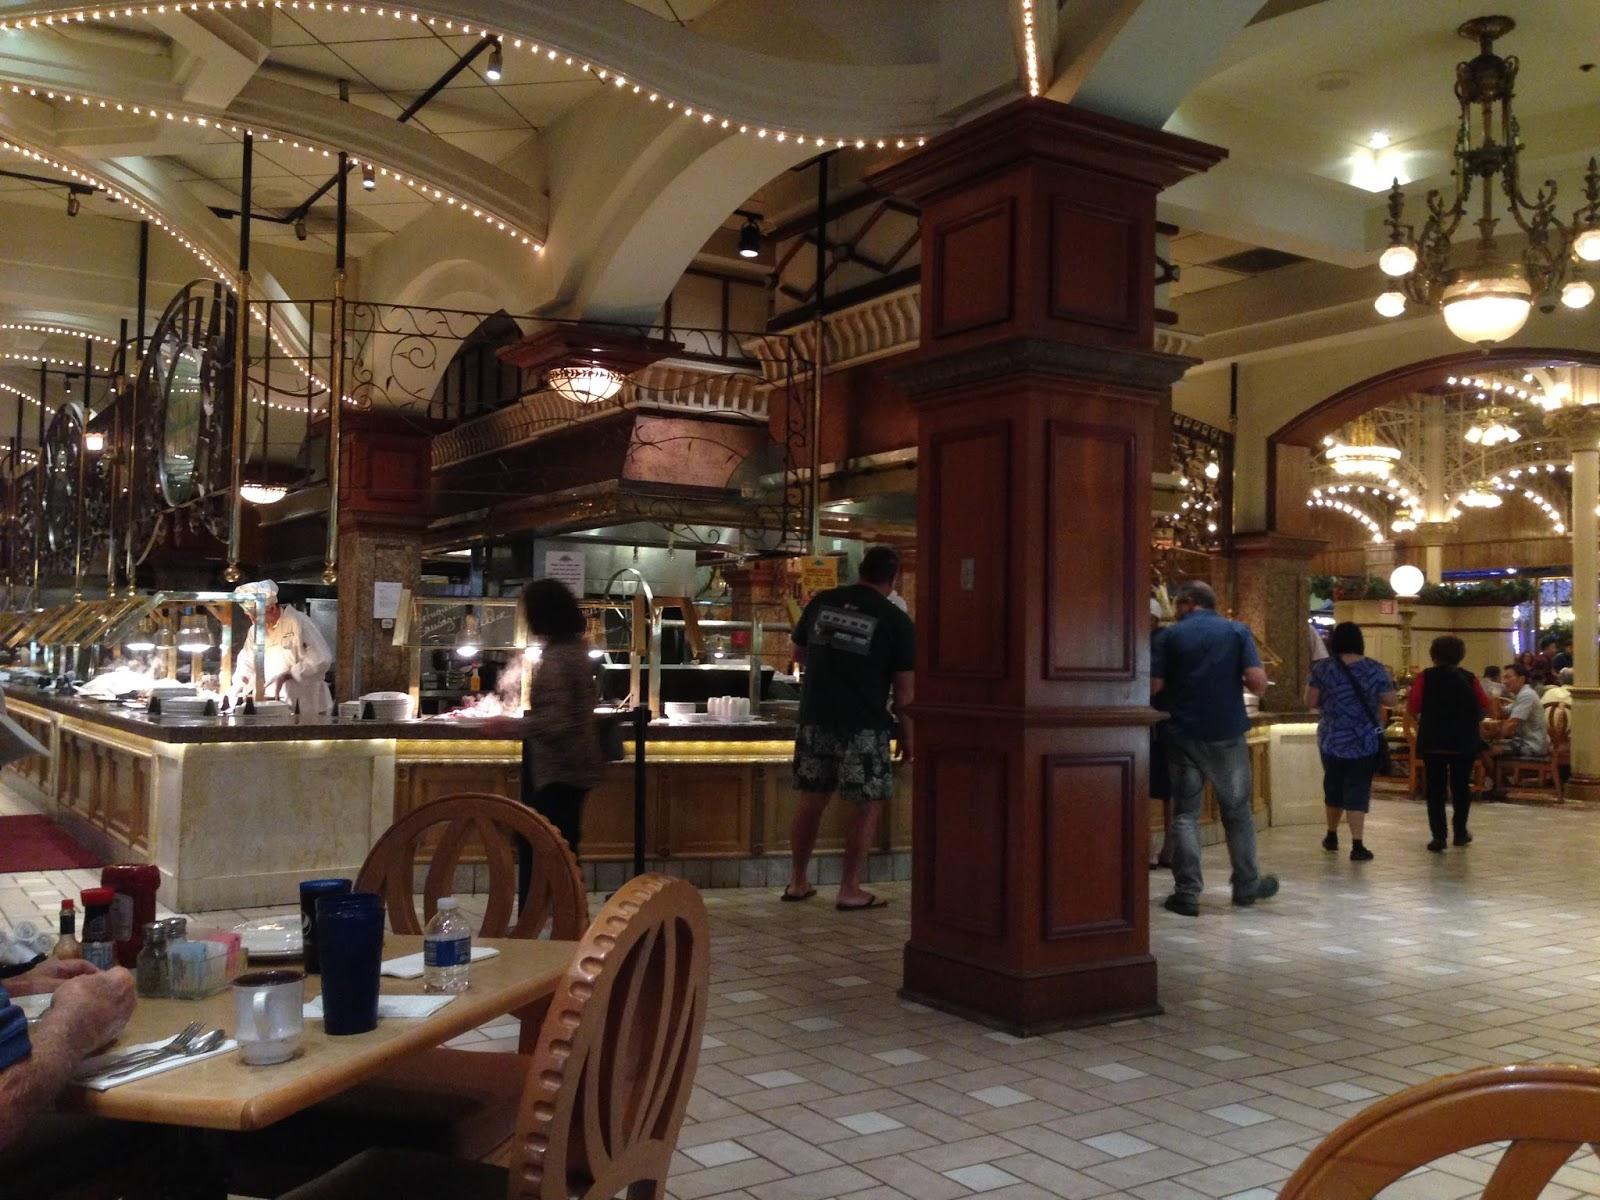 Ellis Island Players Club - Las Vegas Forum